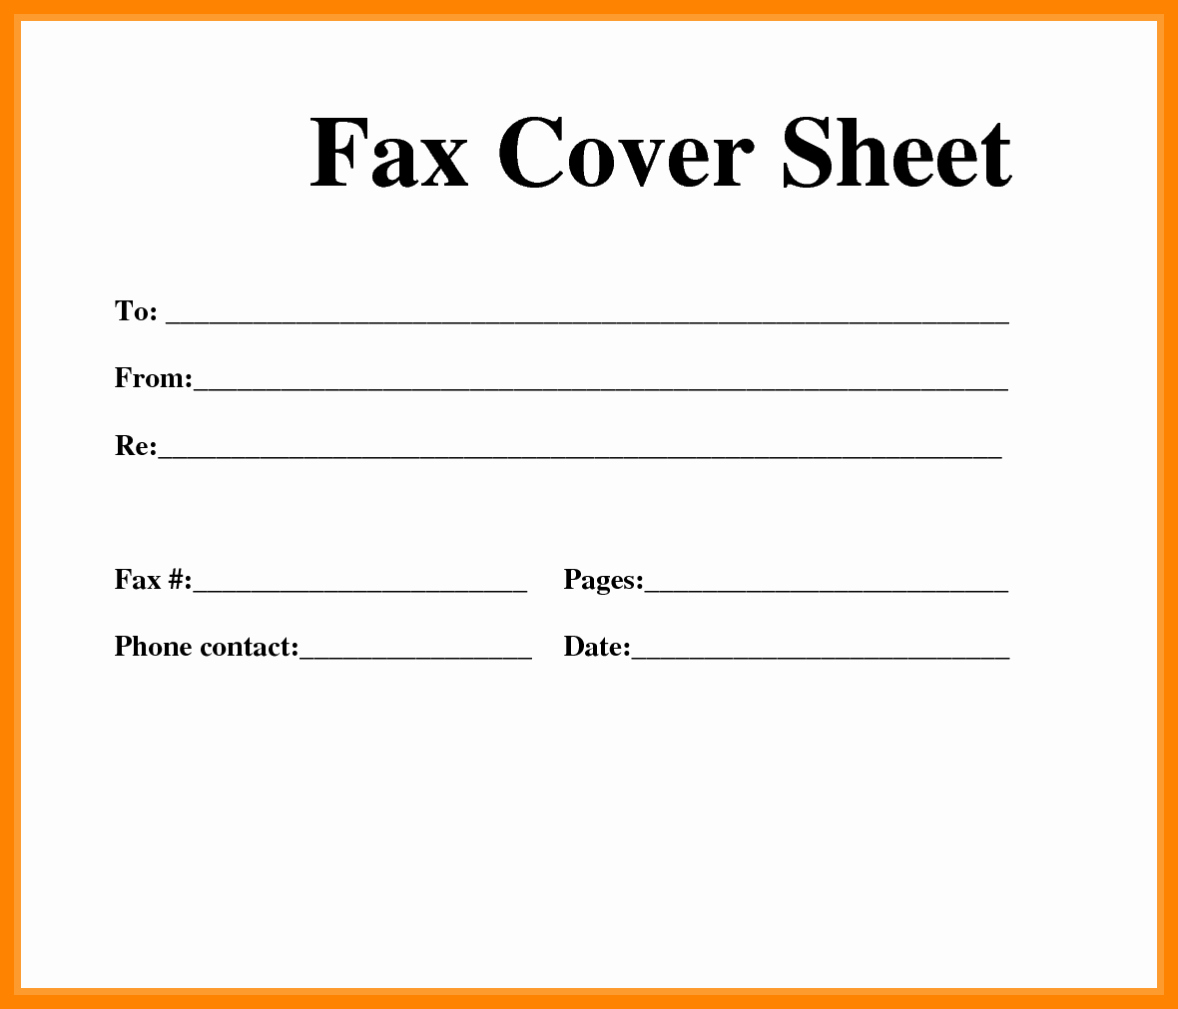 Printable Basic Fax Cover Sheet Beautiful 9 Free Printable Fax Cover Sheets Templates